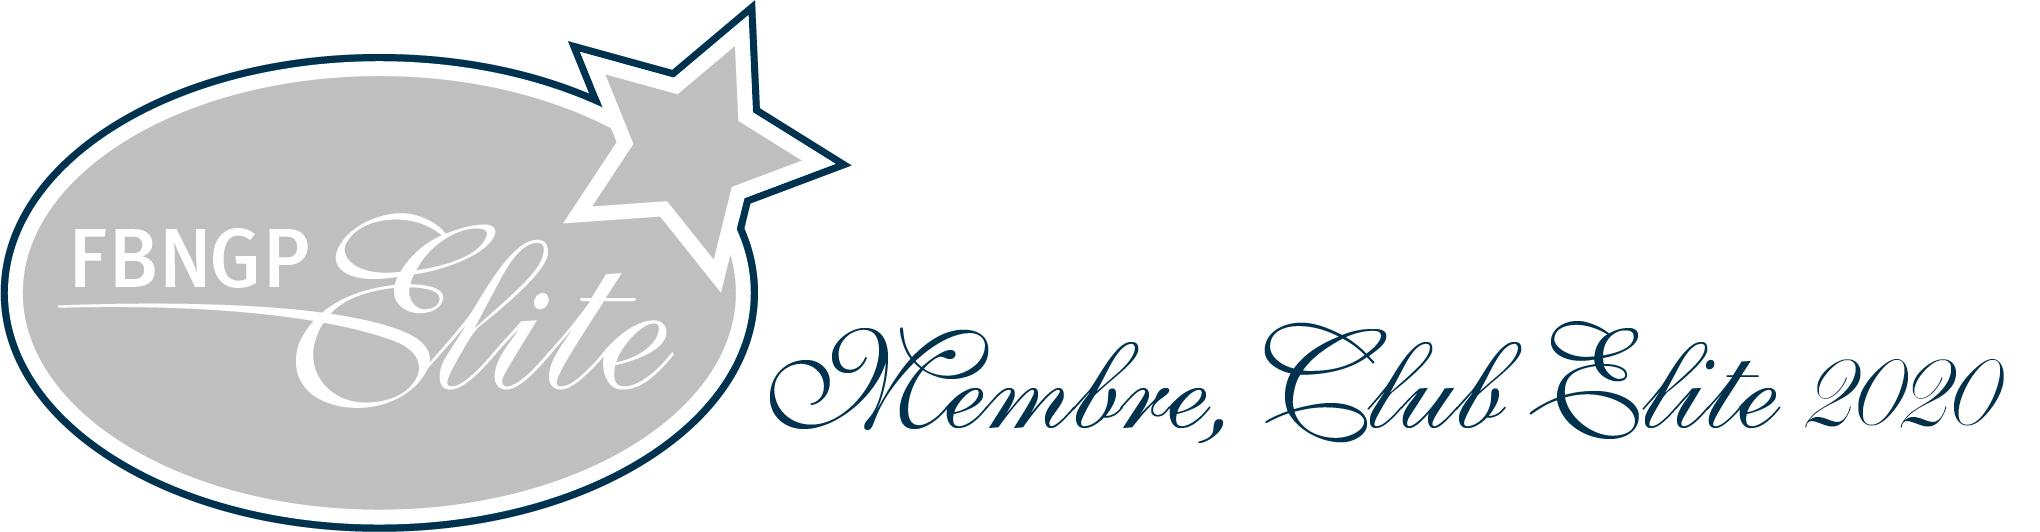 01-Nathalie Richard_Elite Logo_5c_EN-rv7